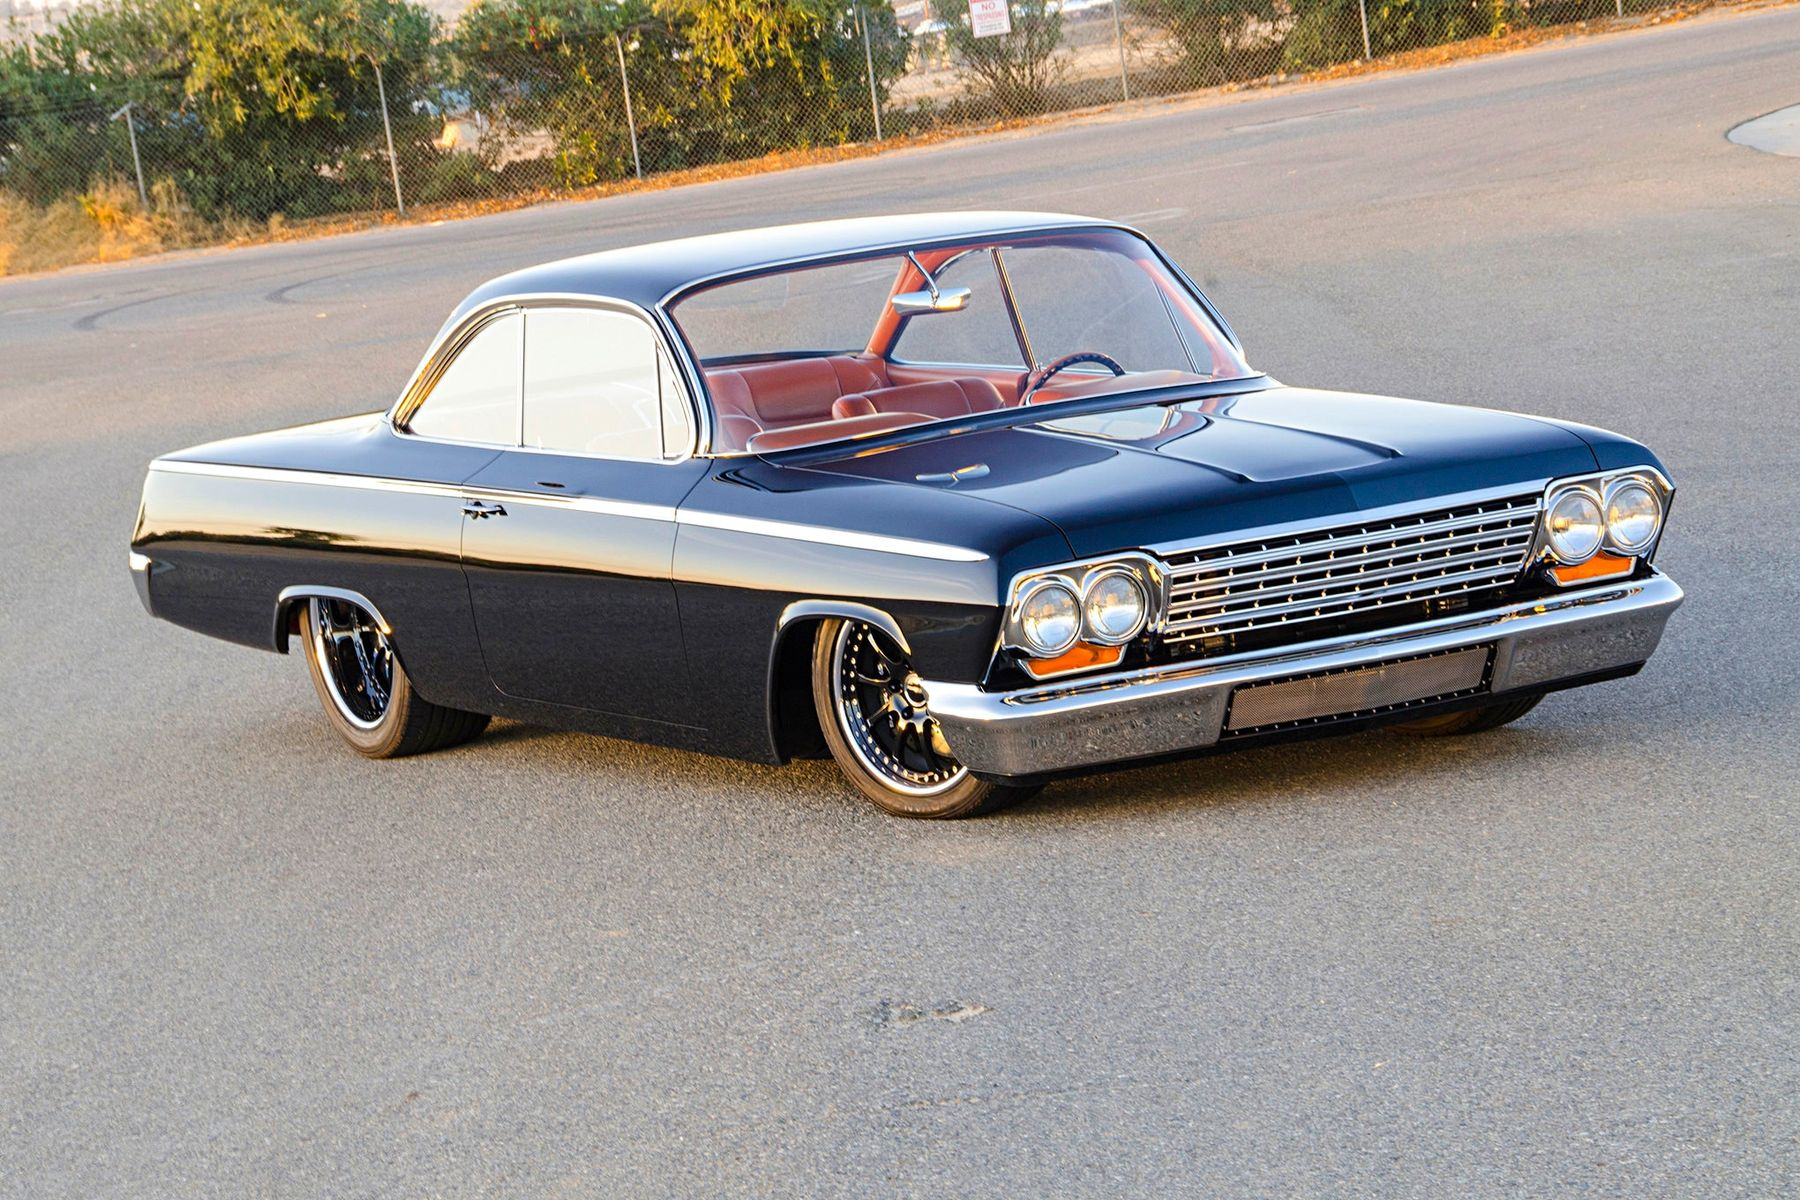 1962 Chevrolet Bel Air | James and Sandy Eudy's '62 Bel Air